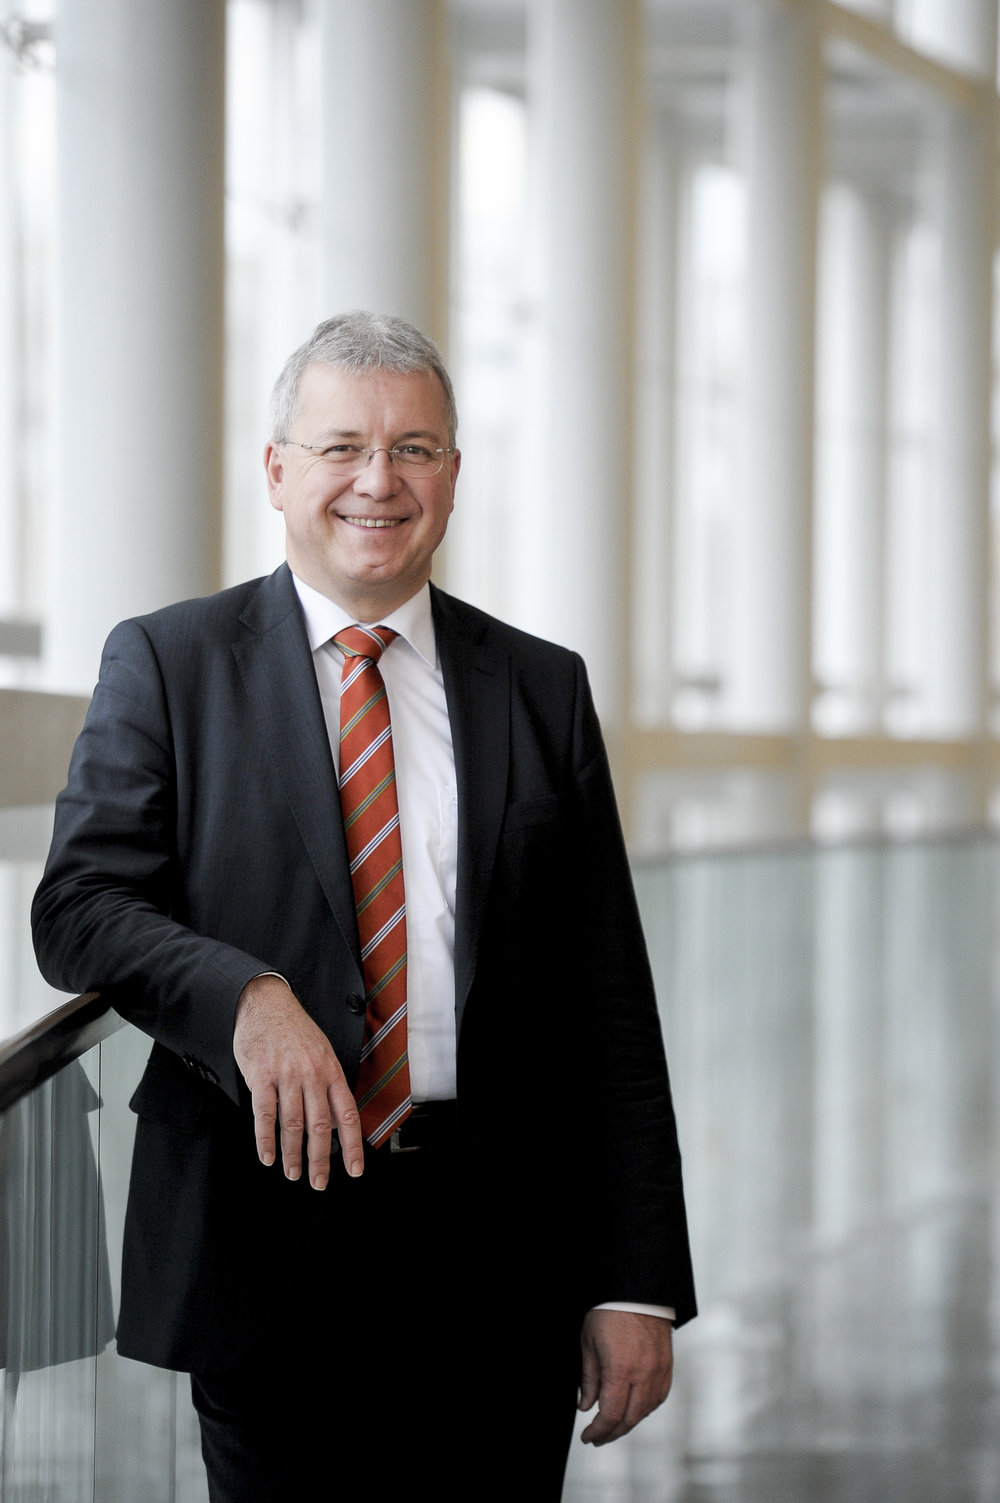 Markus Ferber MEP